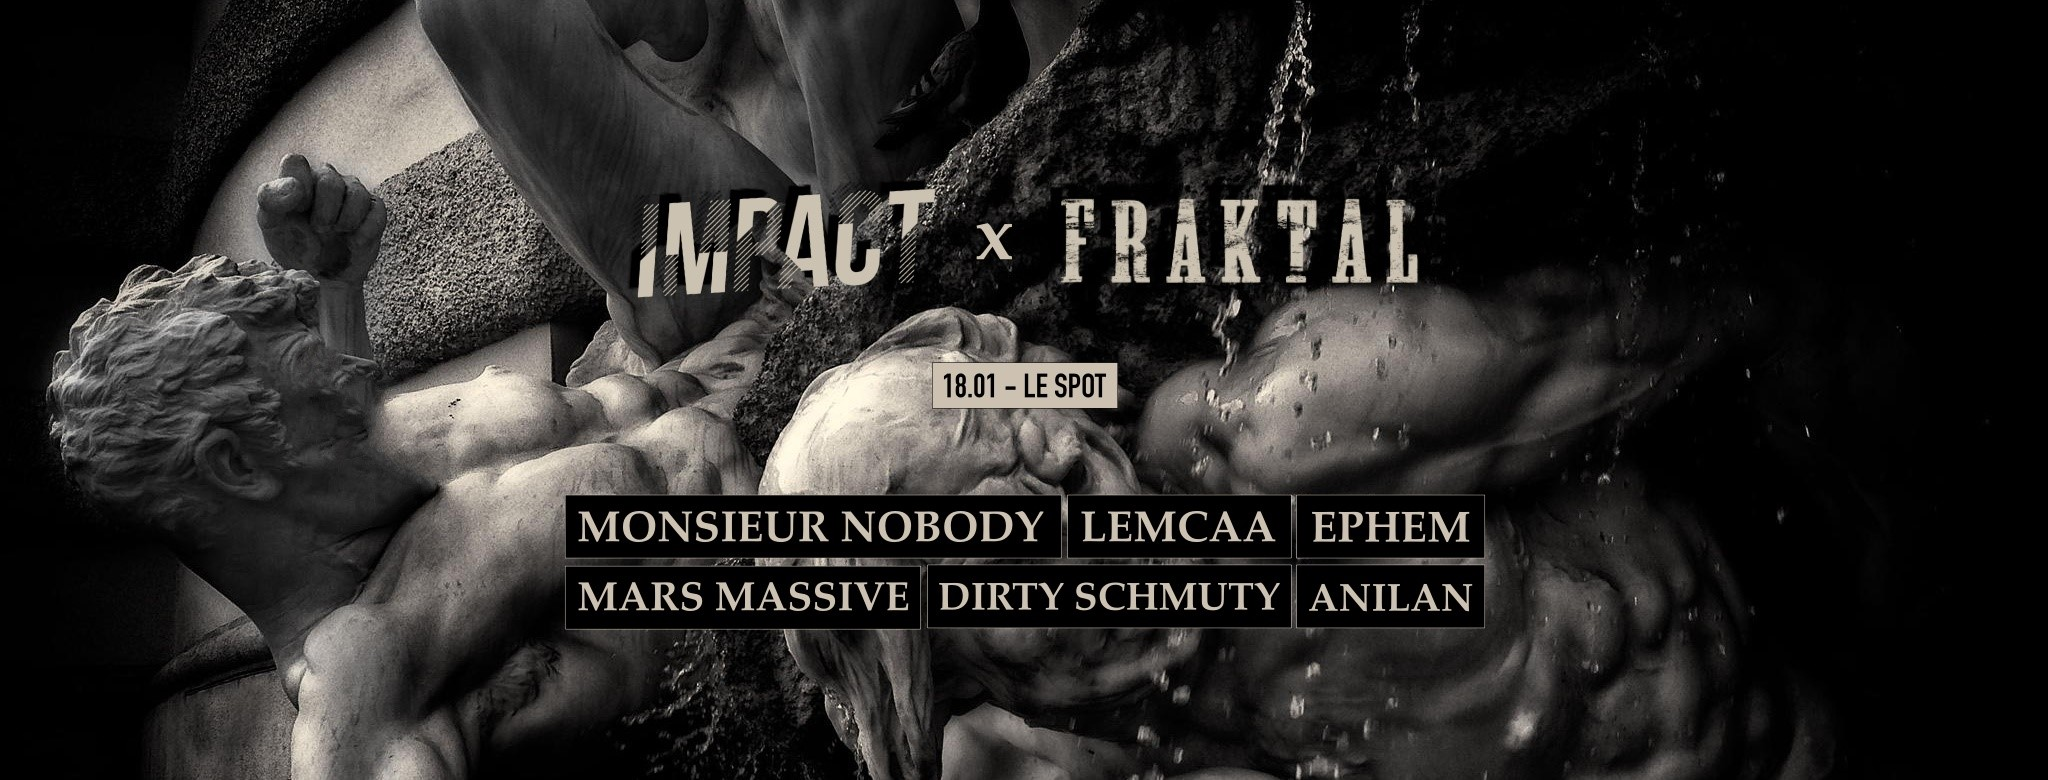 Impact x Fraktal: Le Spot